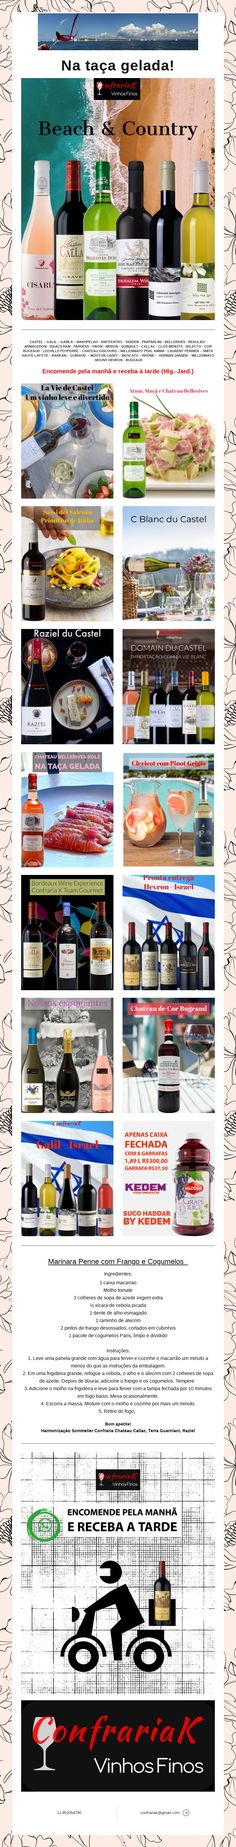 Mouton Cadet, Laurent Perrier, Wine Pairings